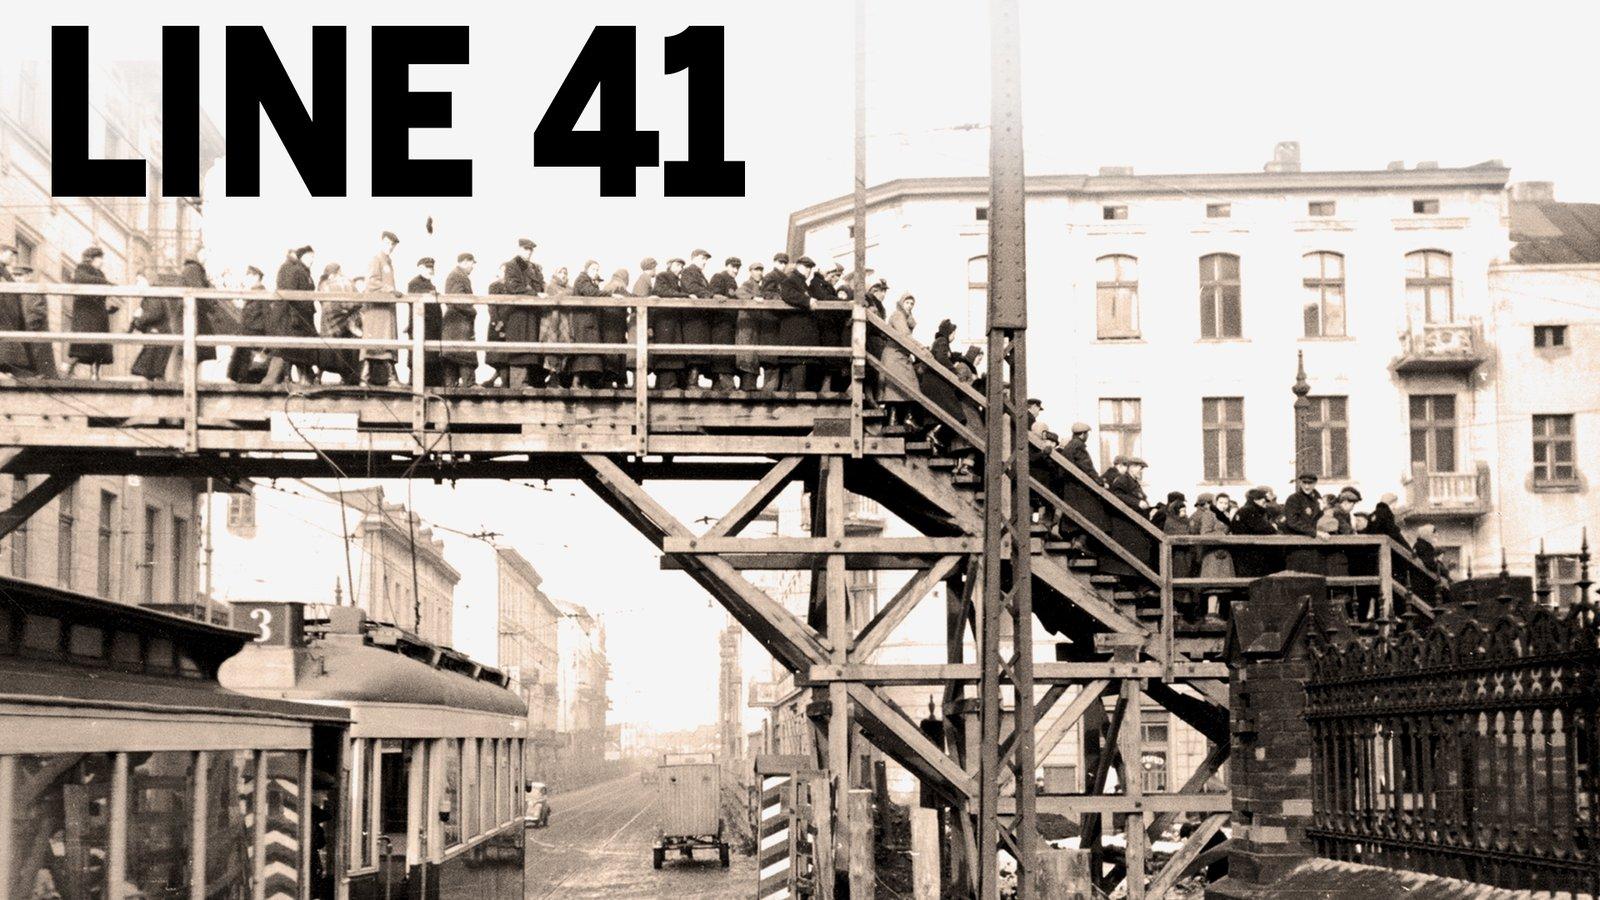 Line 41 - A Holocaust Survivor Returns to Poland and Confronts the Past